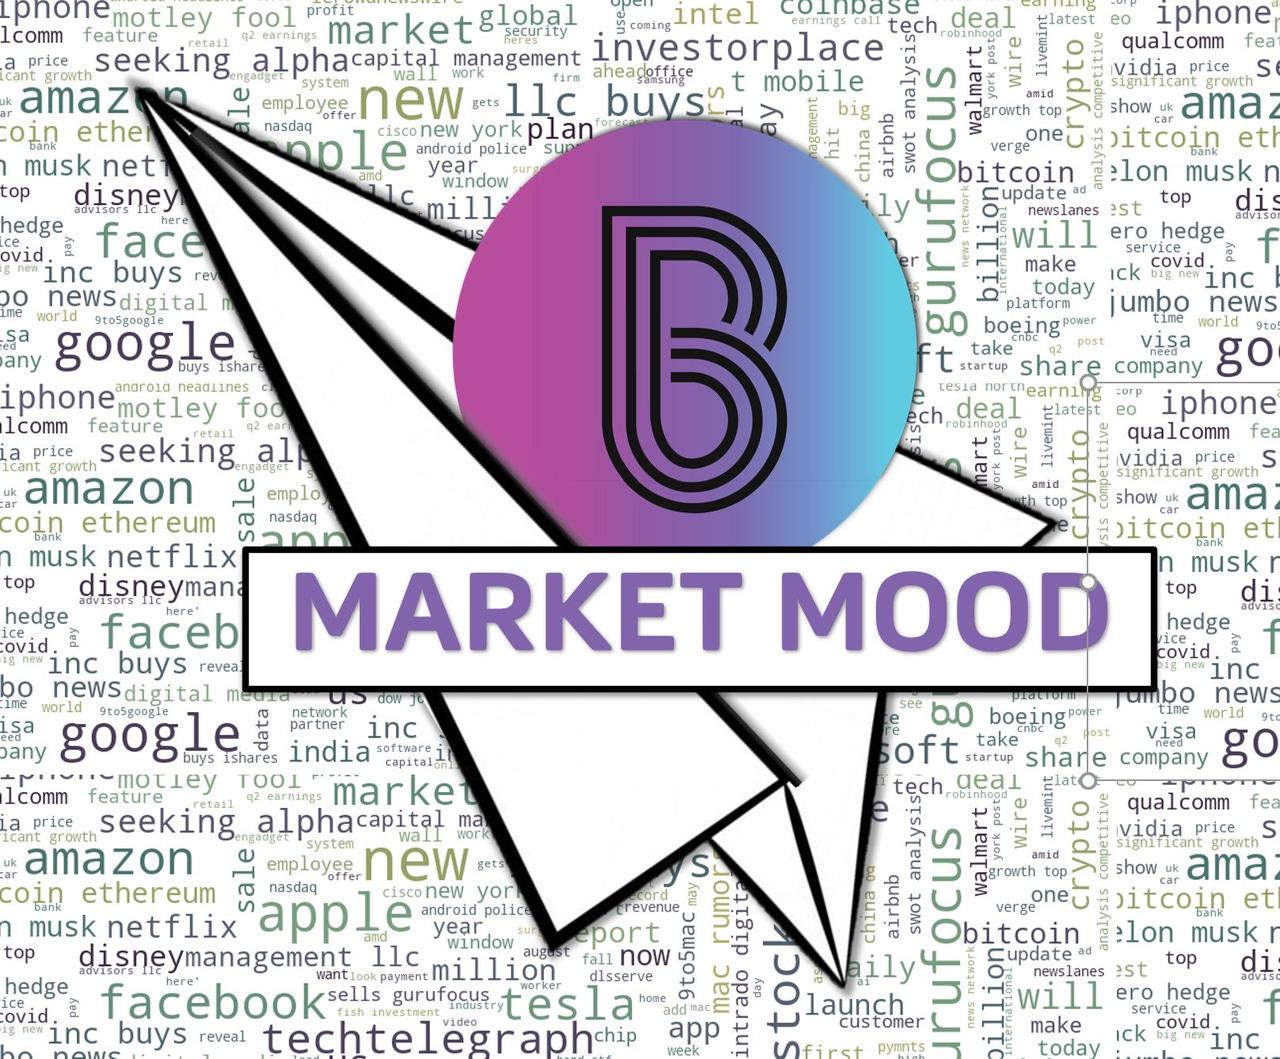 Market Mood